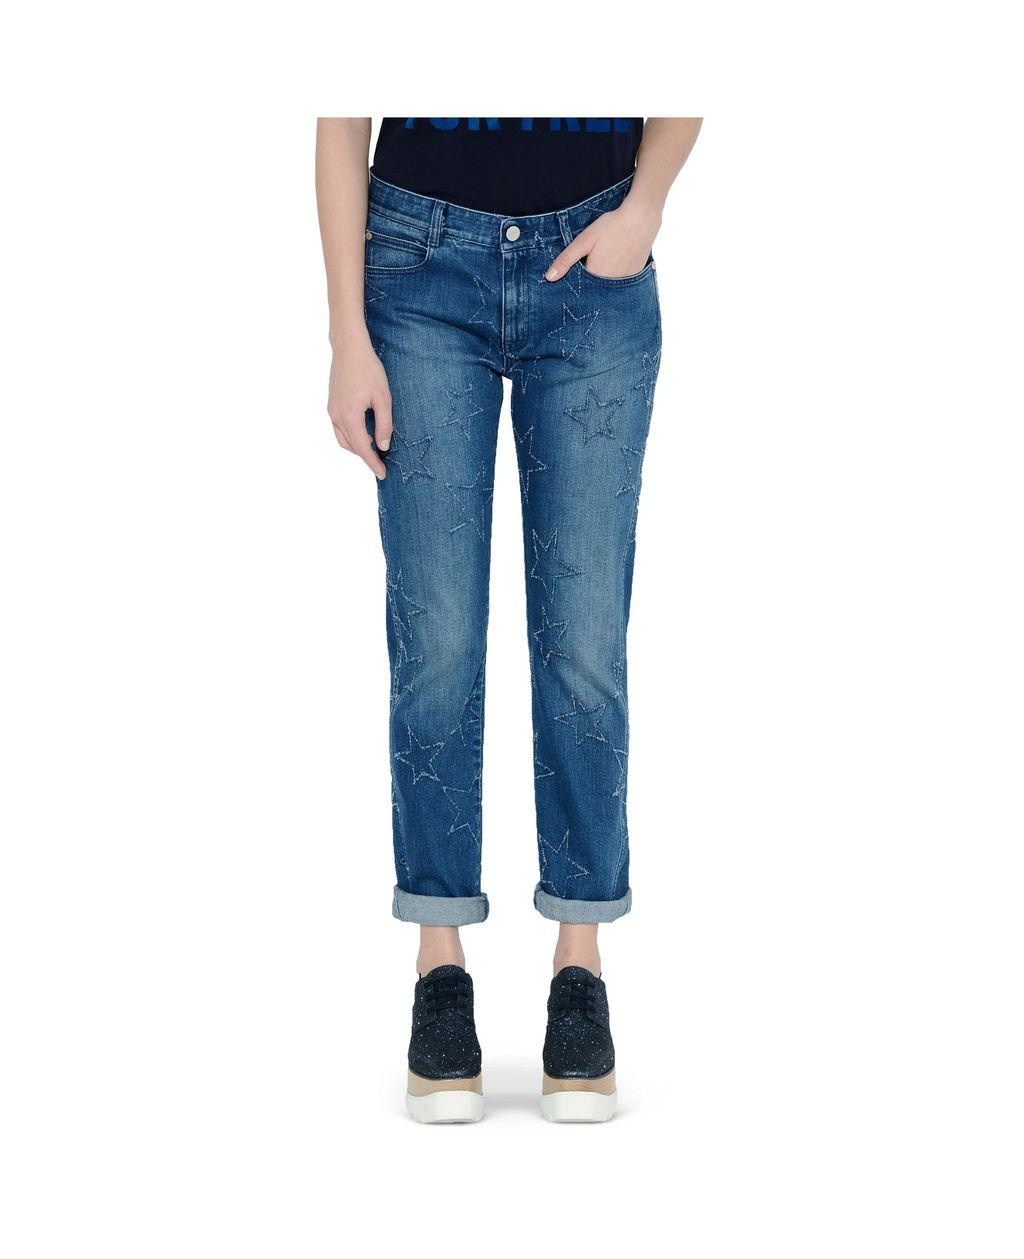 Fringed Stars Boyfriend Jeans - STELLA MCCARTNEY